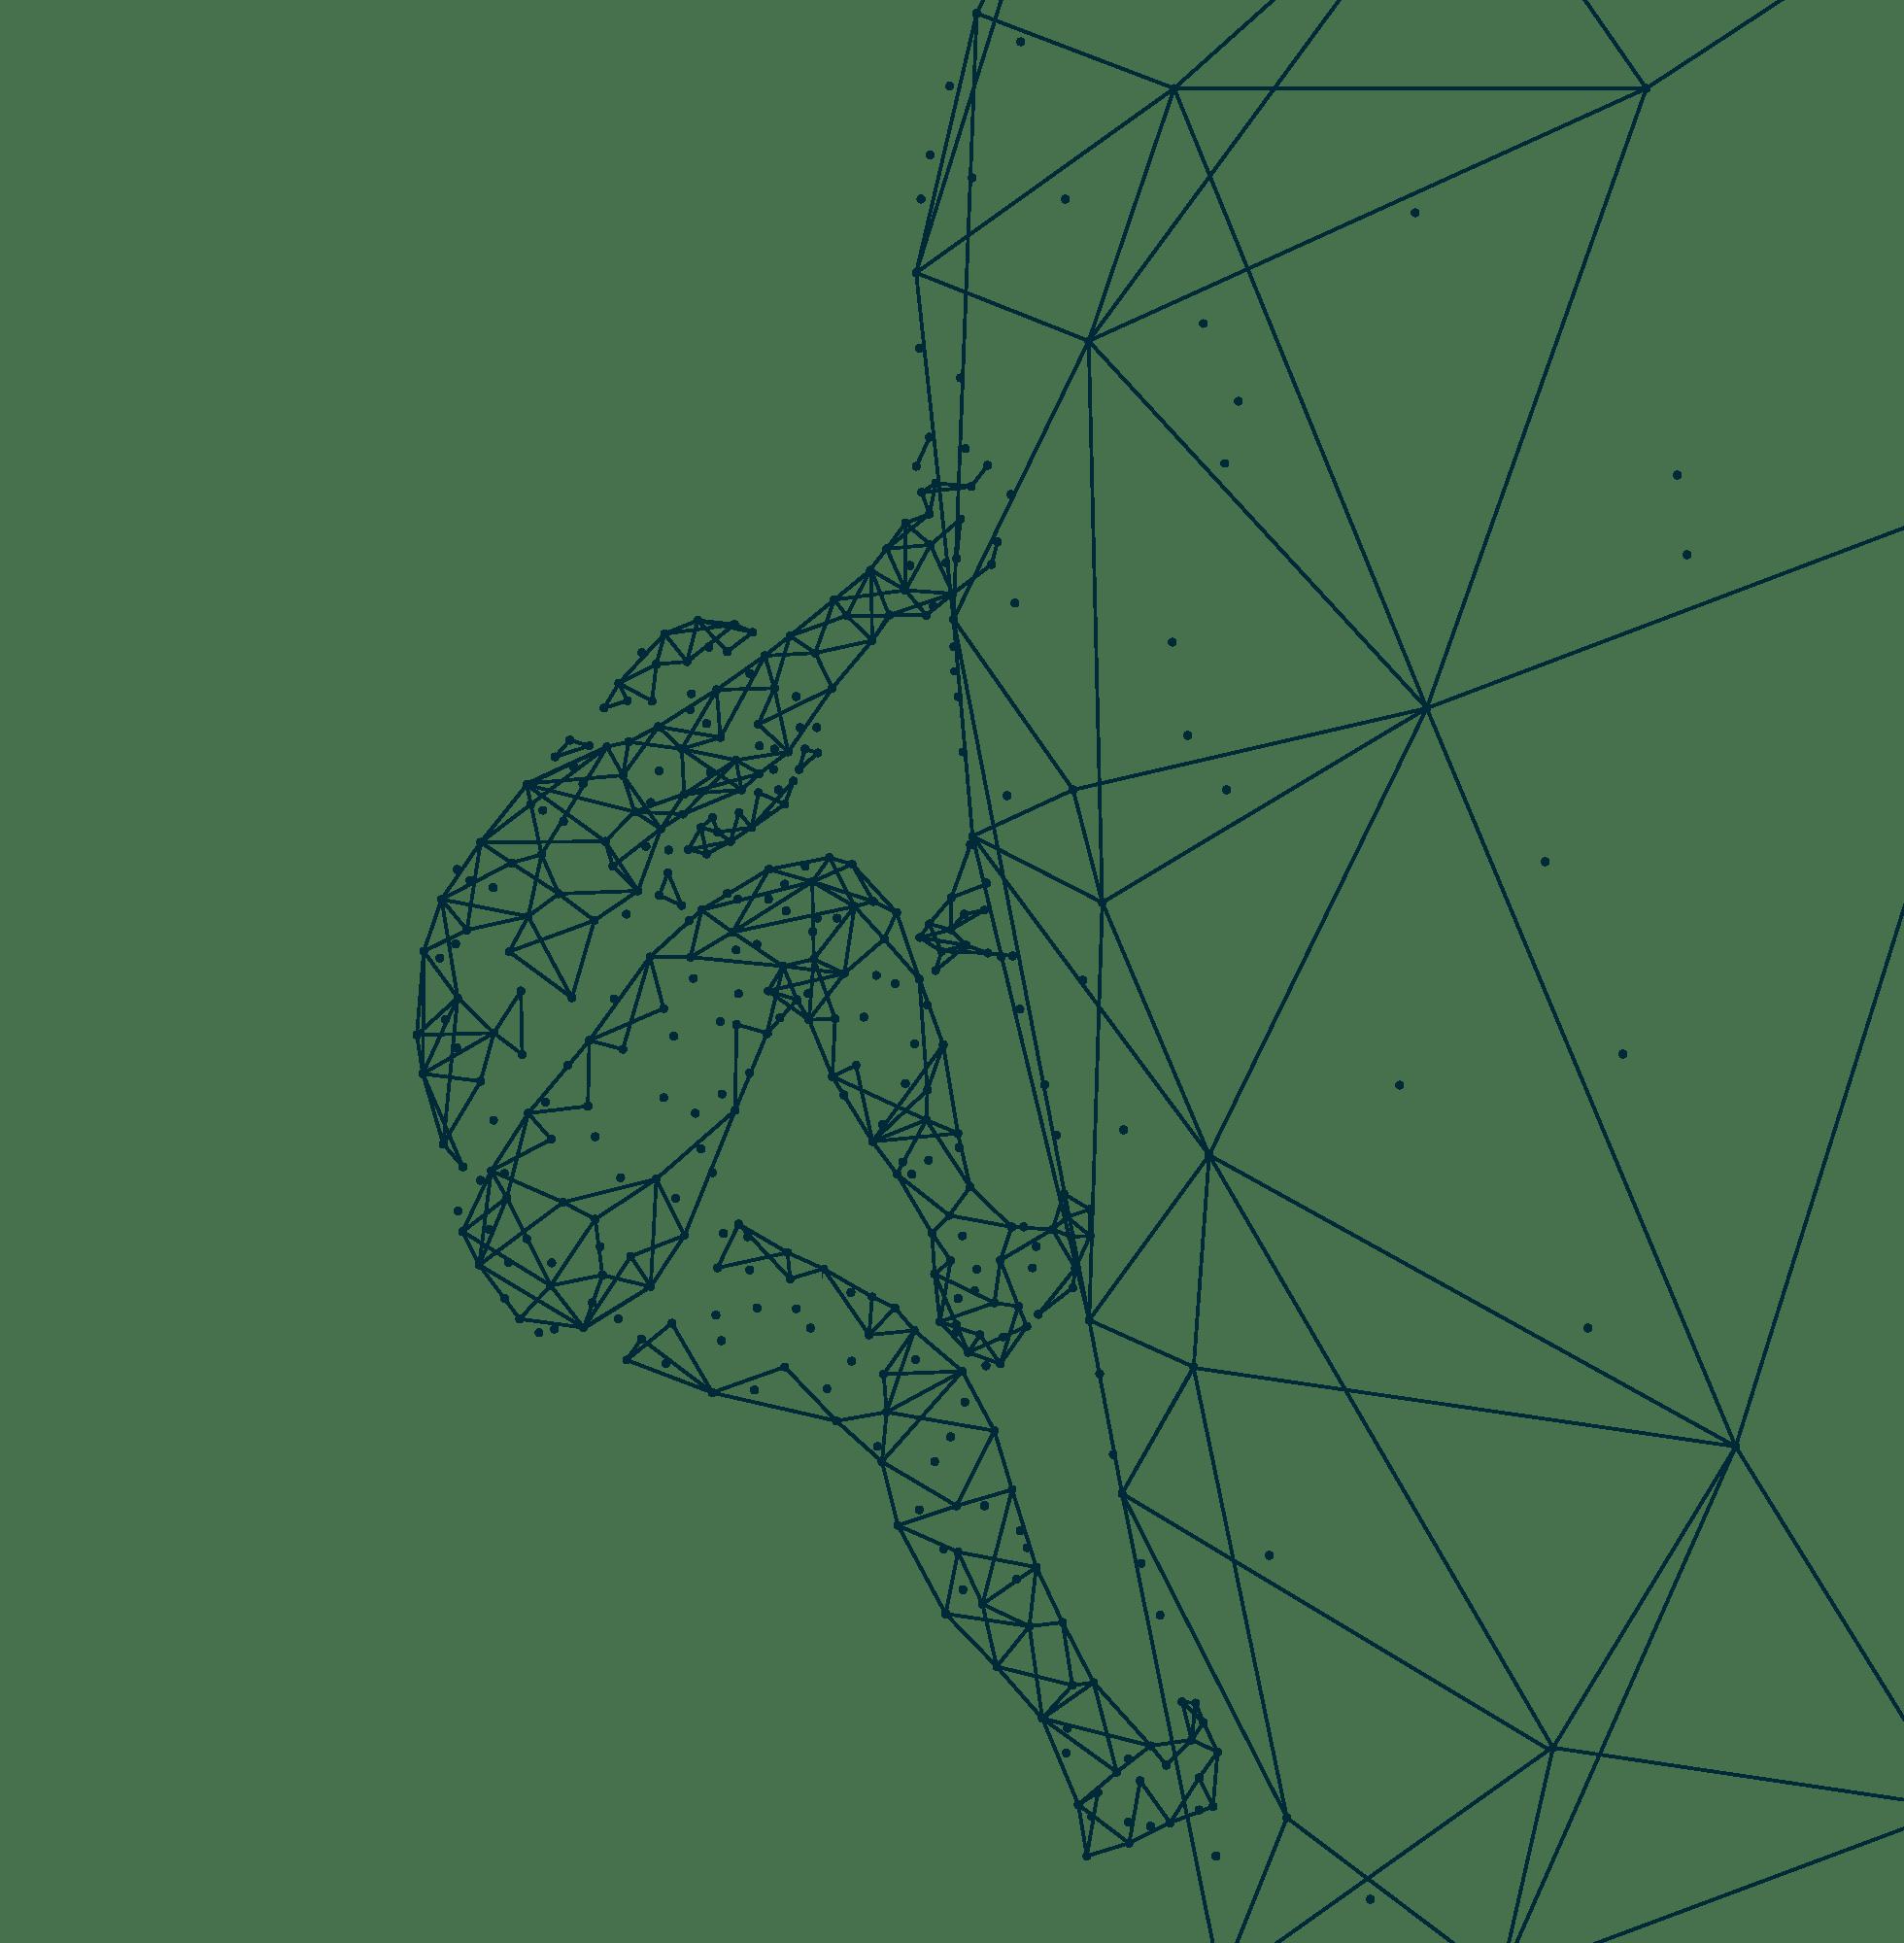 Running Geometric Man